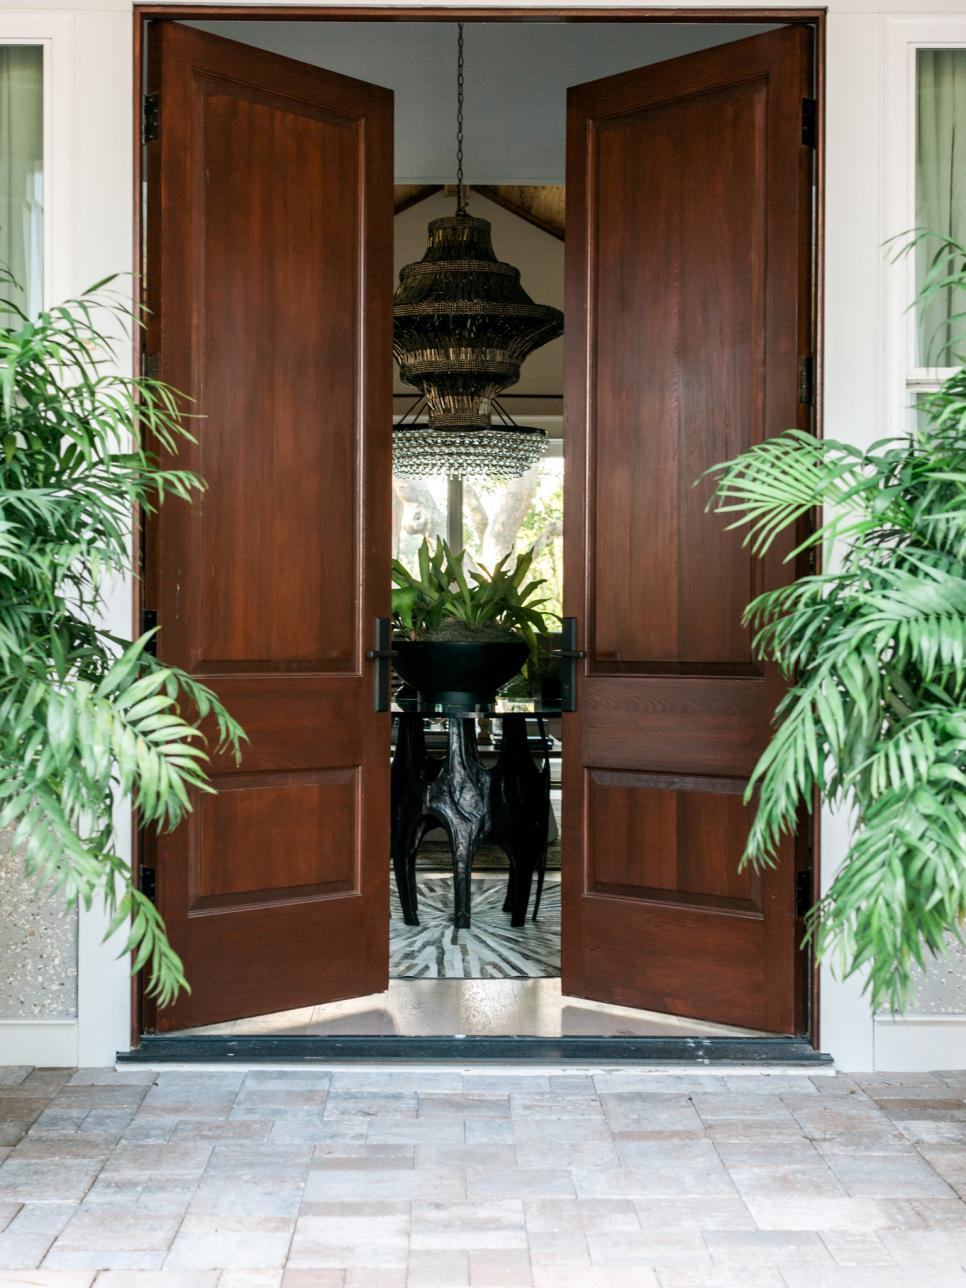 Hgtv dream home 2017 front yard pictures hgtv dream for Latest door design 2016